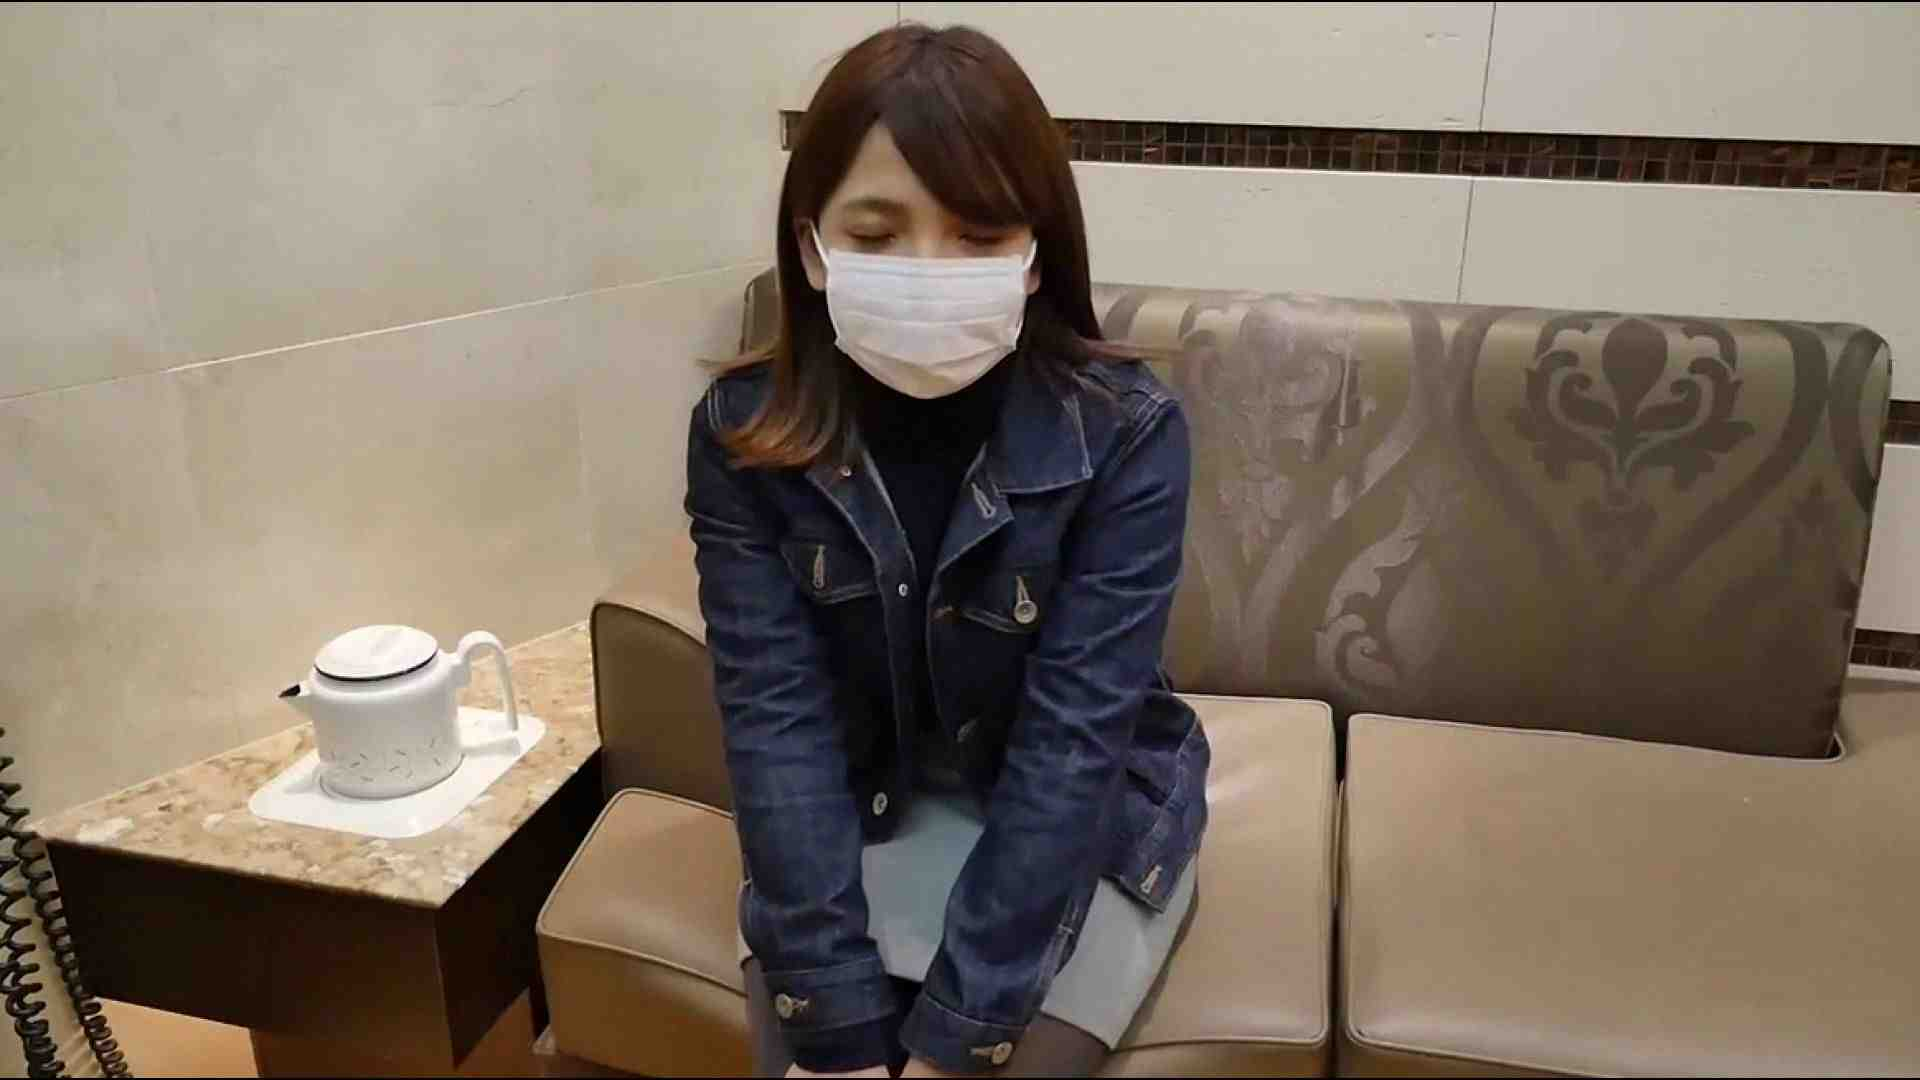 S級厳選美女ビッチガールVol.41 前編 モデル | 美女丸裸  99pic 1